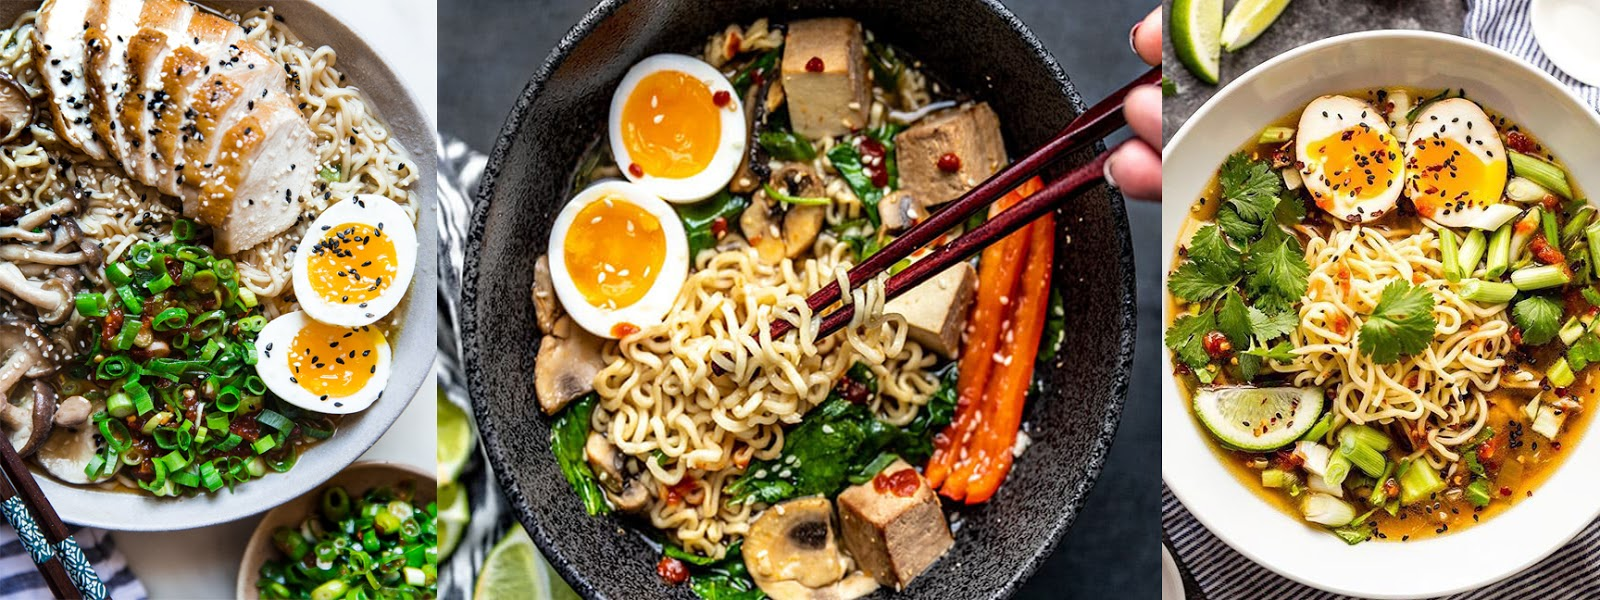 03 ways to cook popular ramen noodles with egg  vestellite